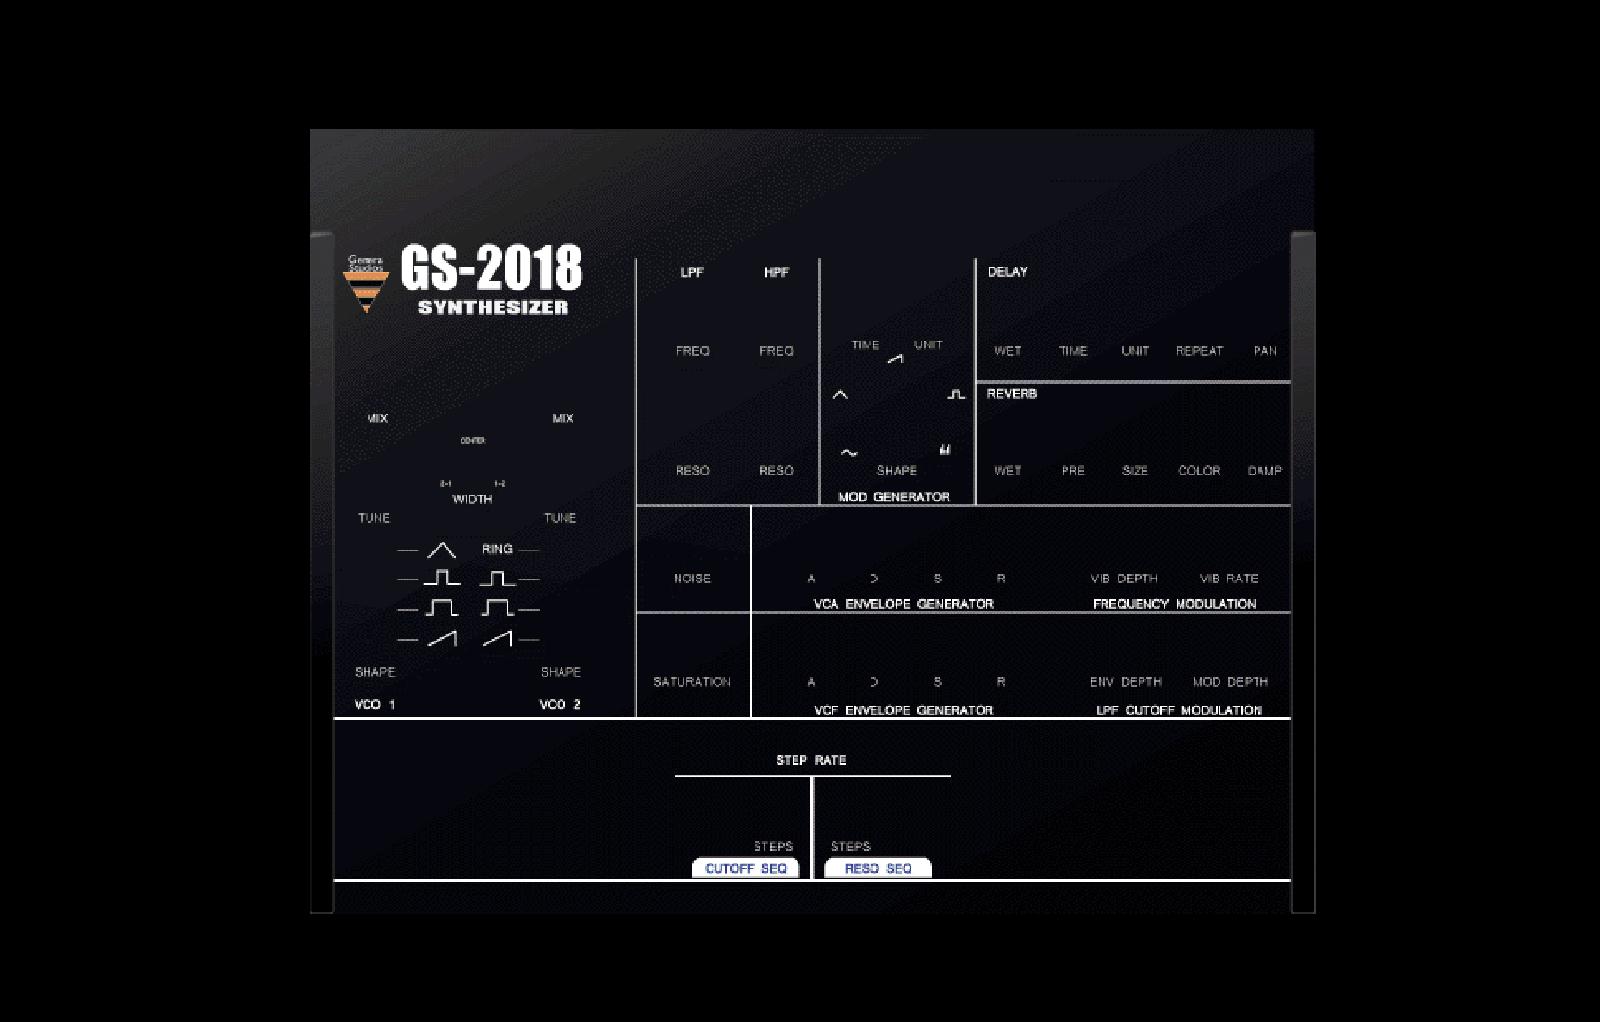 GS-2018